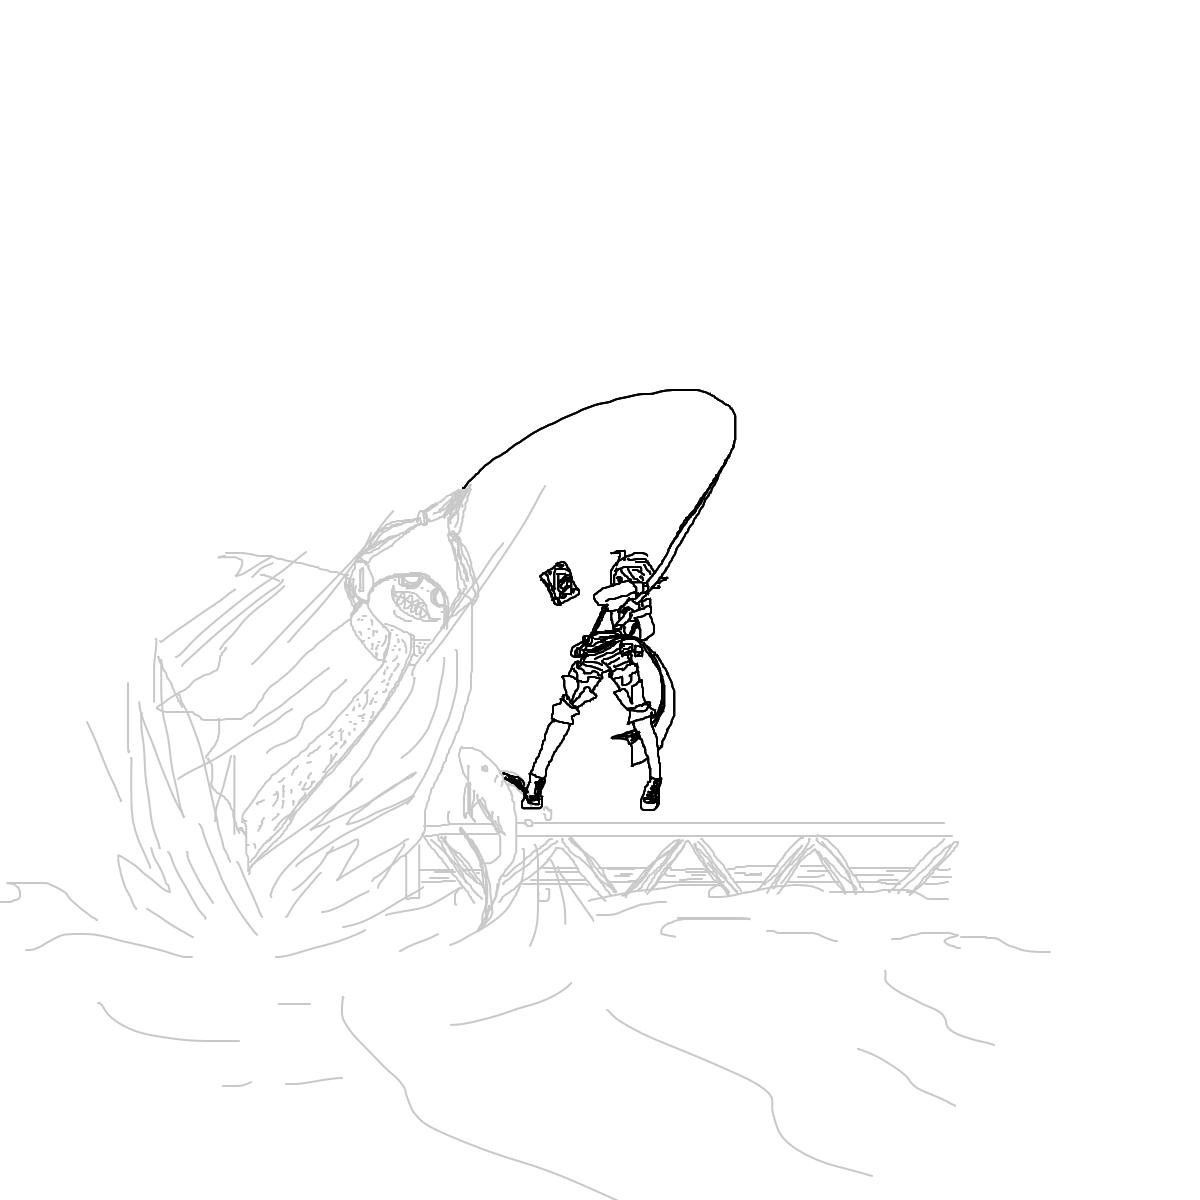 BAAAM drawing#24139 lat:78.4175720214843800lng: -4.4388713836669920